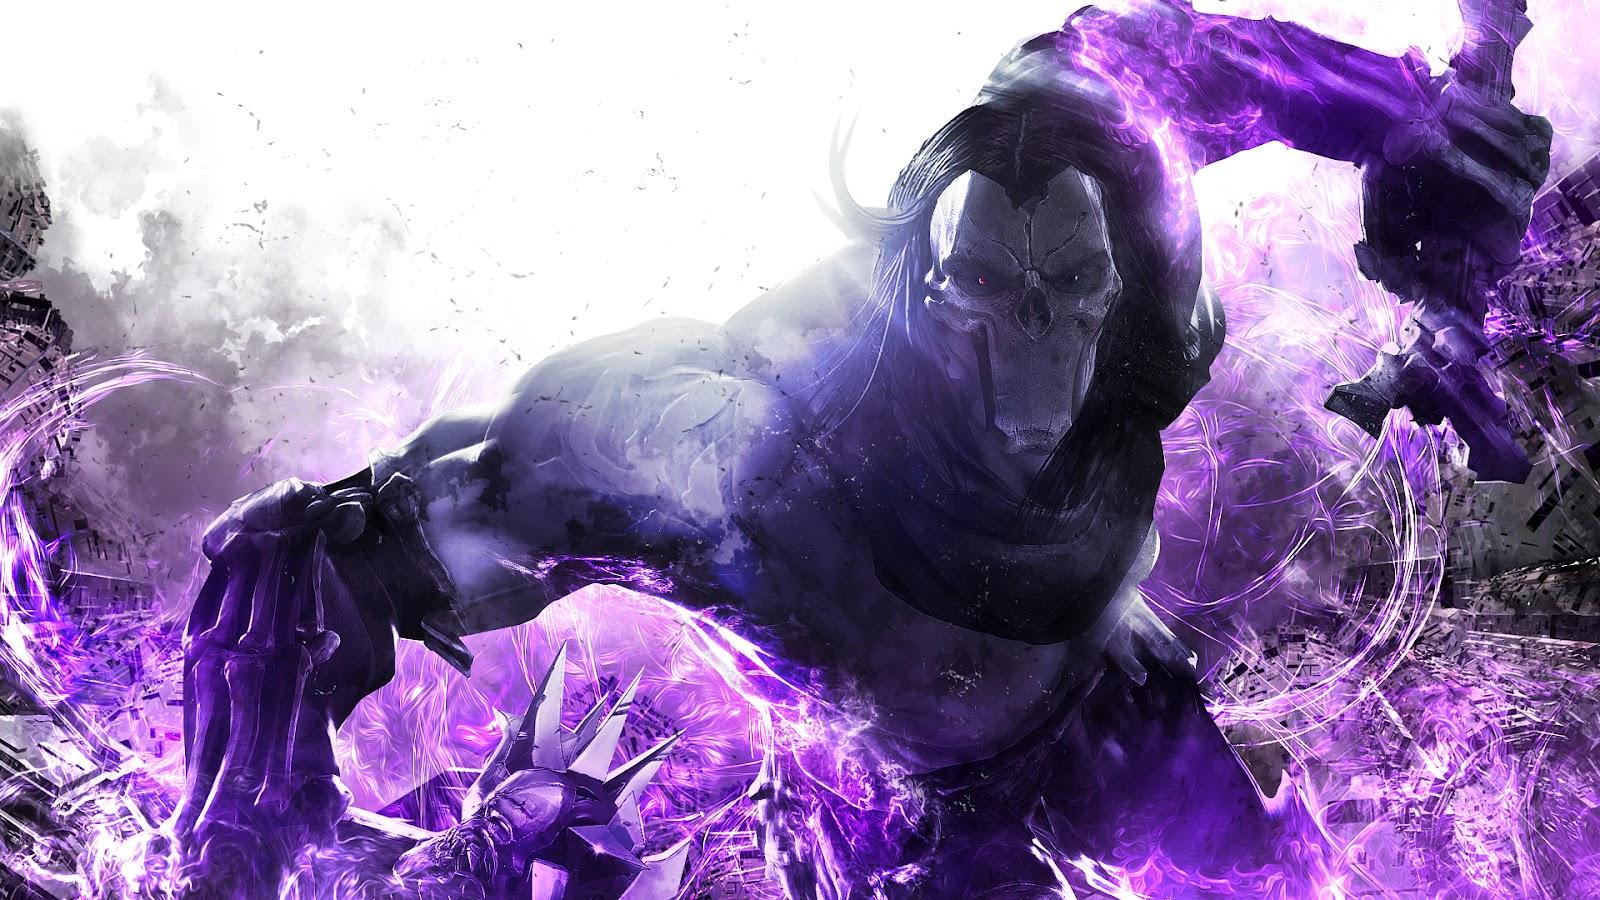 Darksiders 2 Death Alives HD Wallpaper 1080p   HD Dock 1600x900